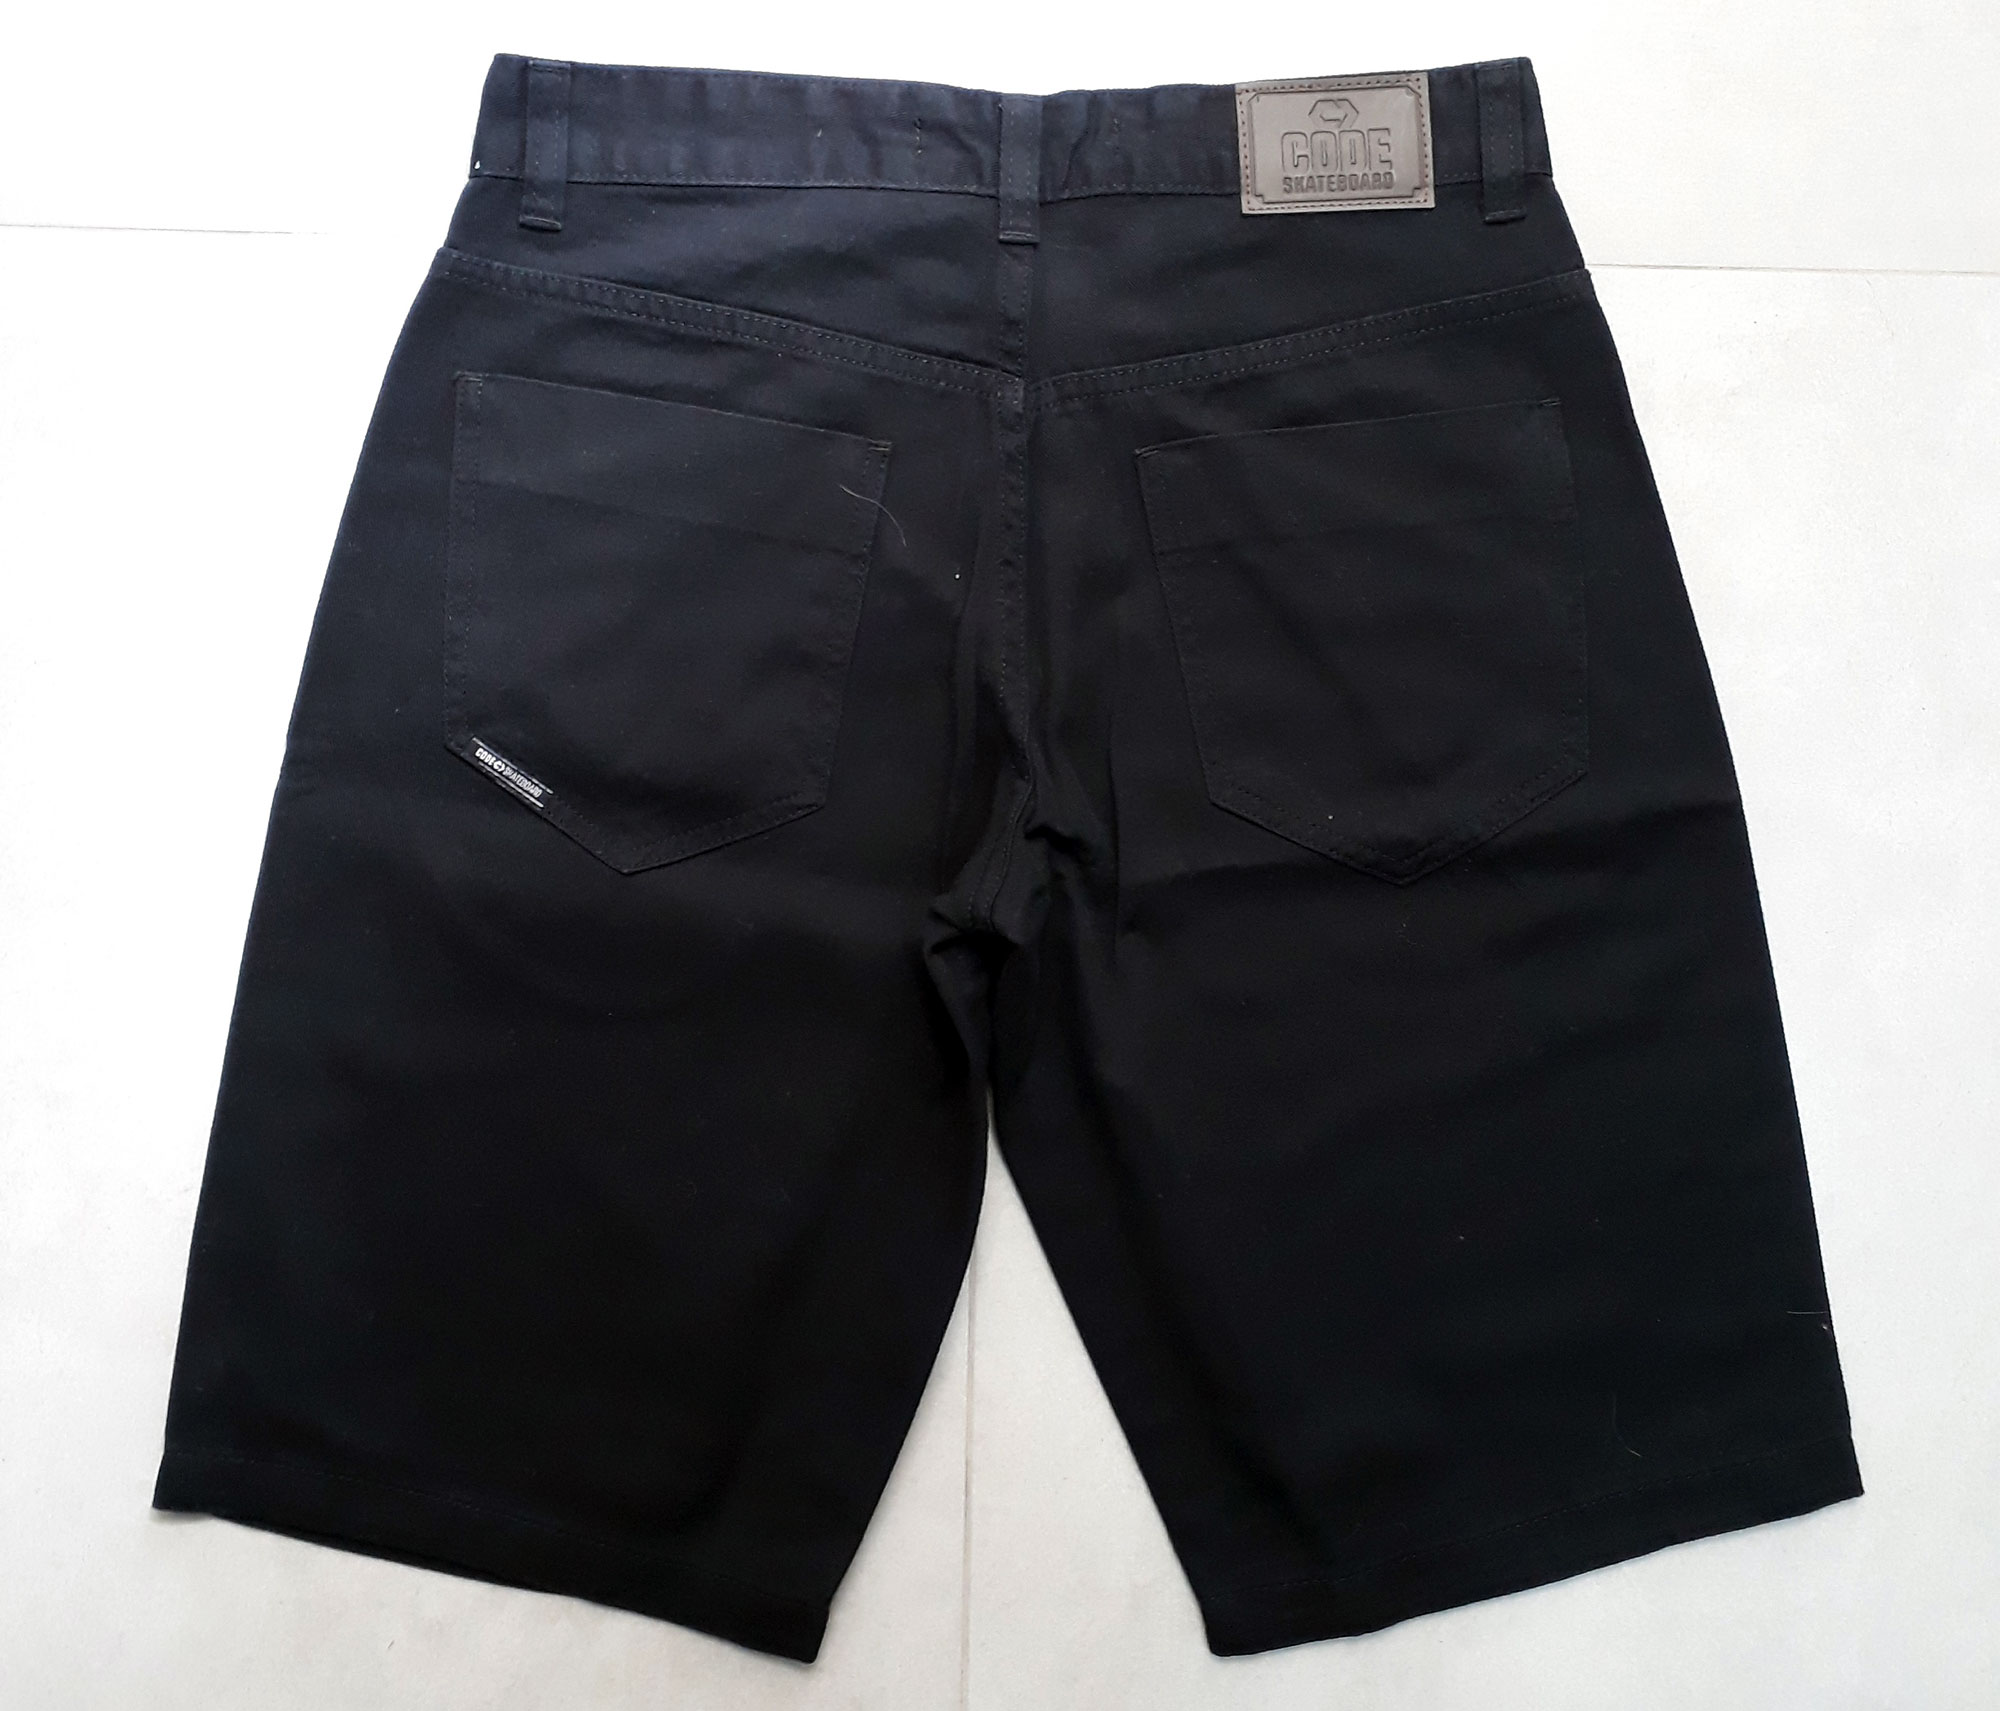 Bermuda Walk Code Cotton - 38